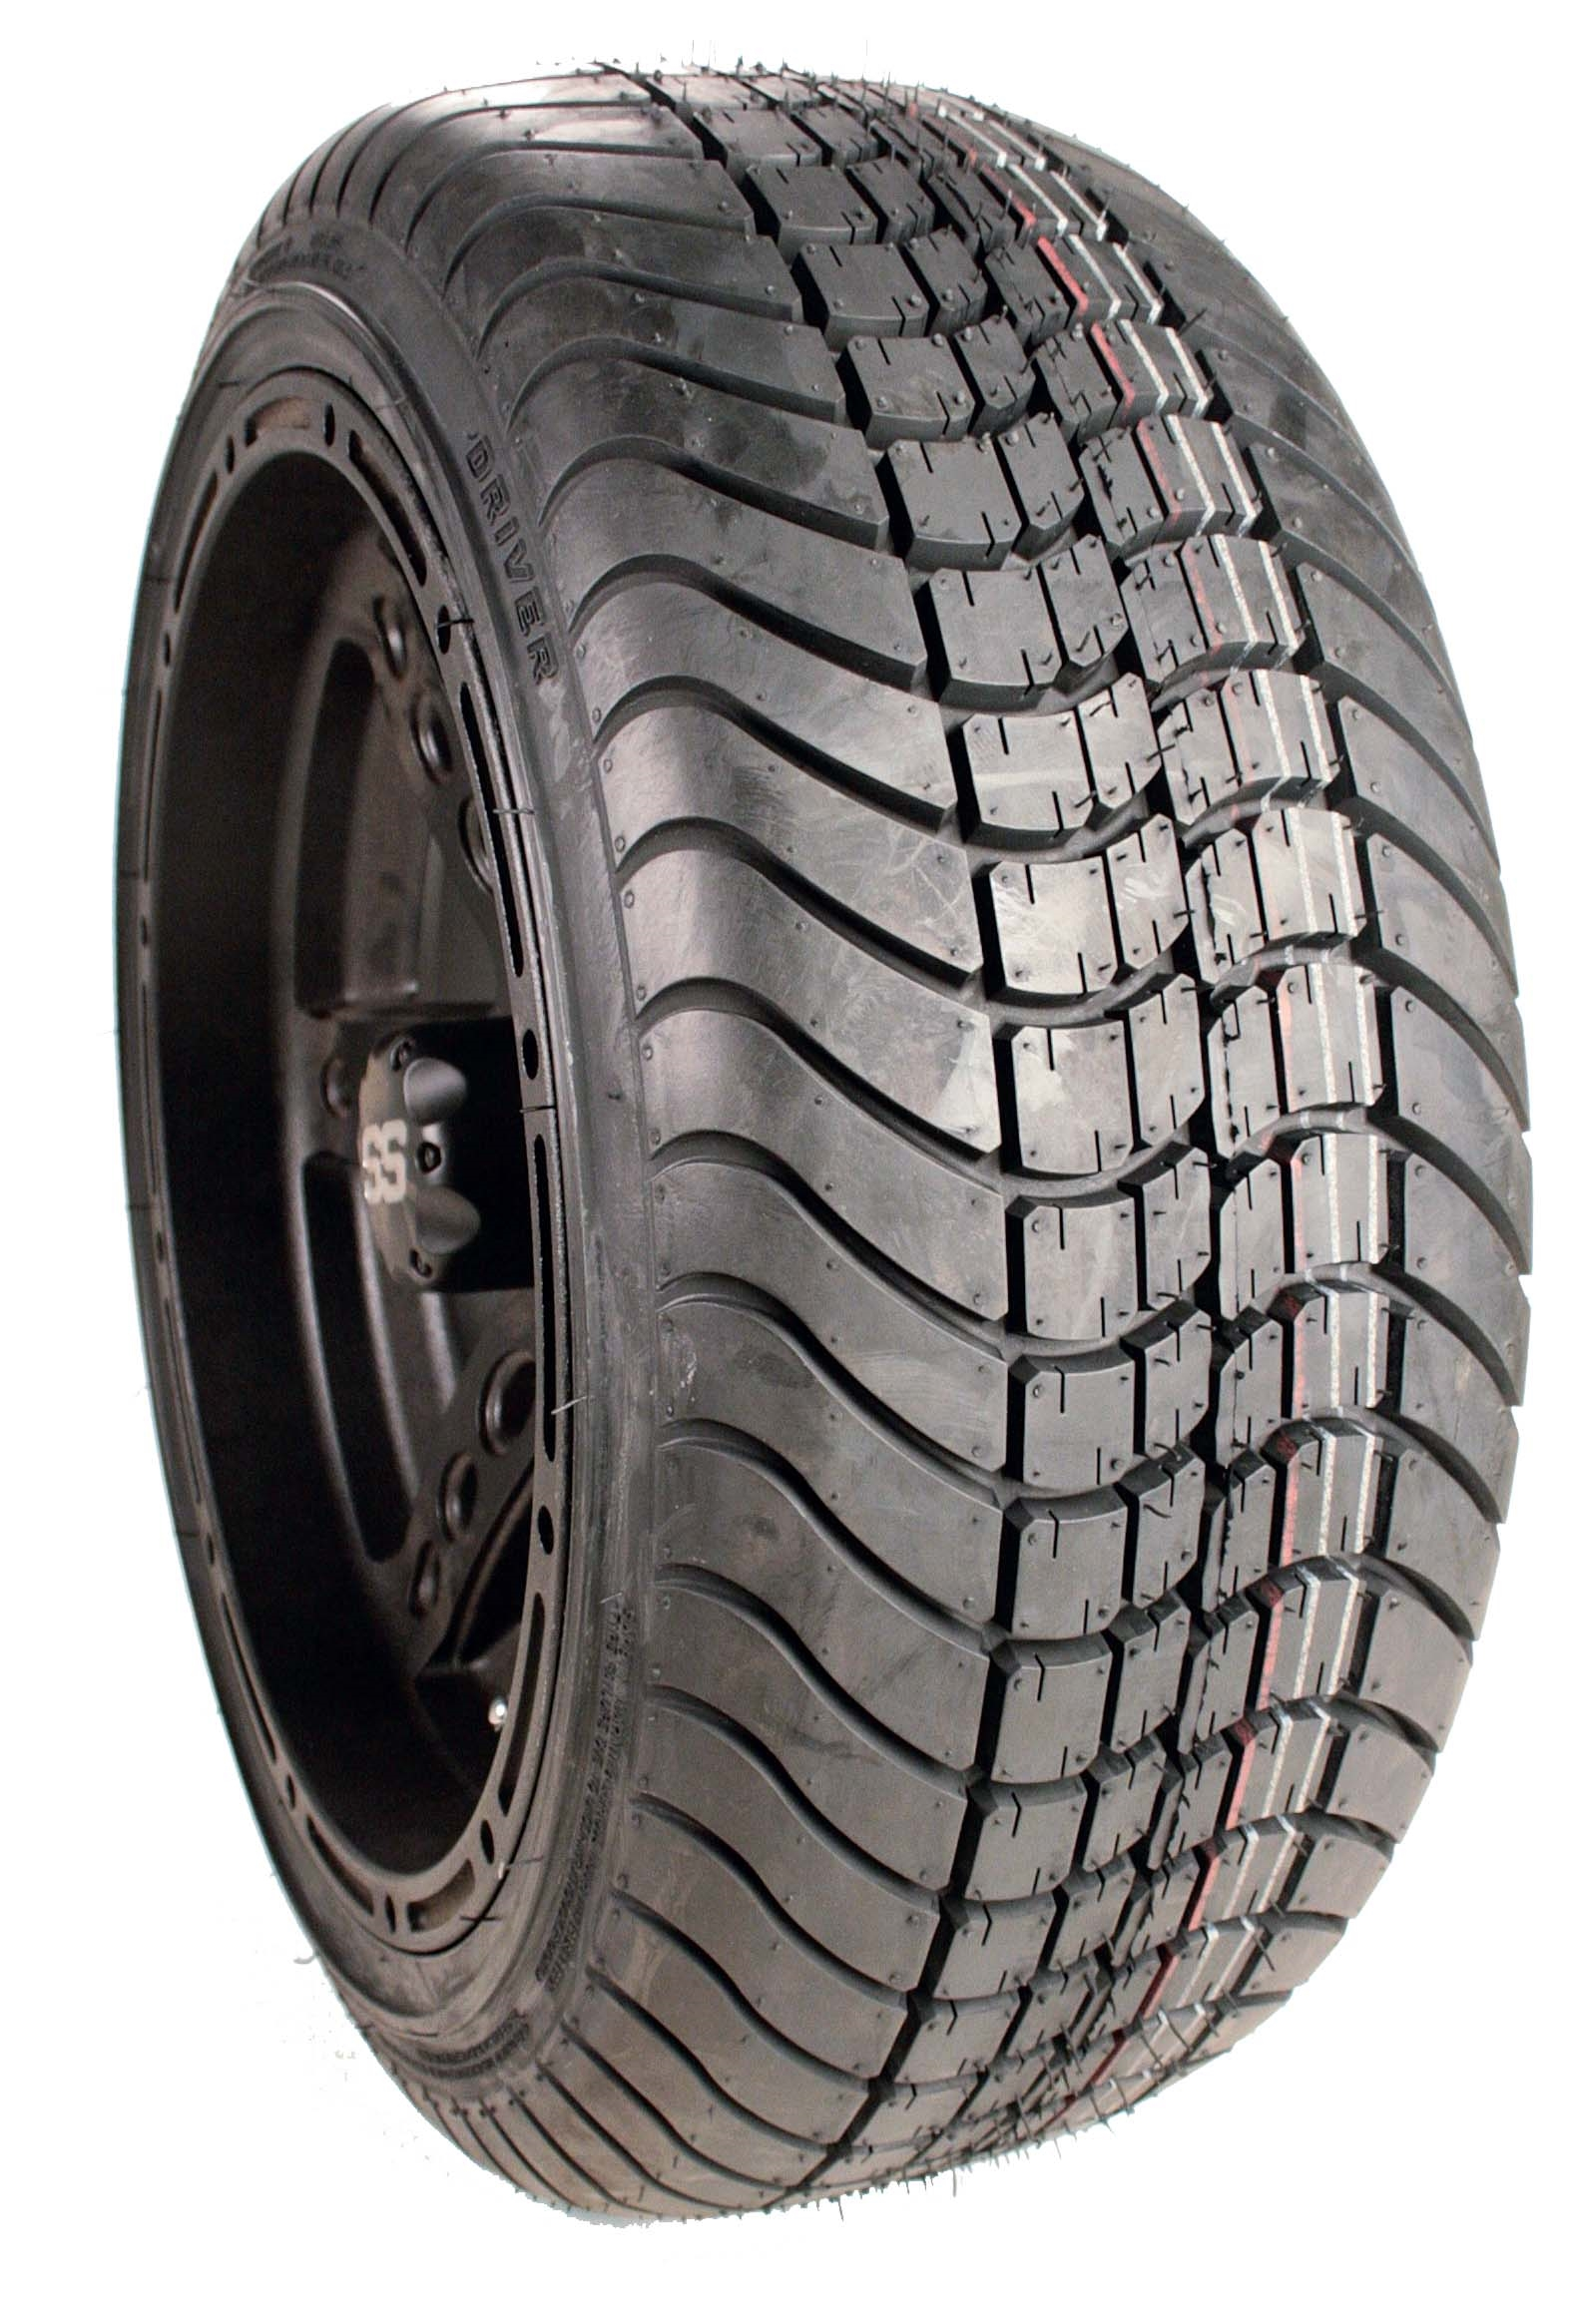 Inova Tore tire 205 40 r14 4pr innova driver